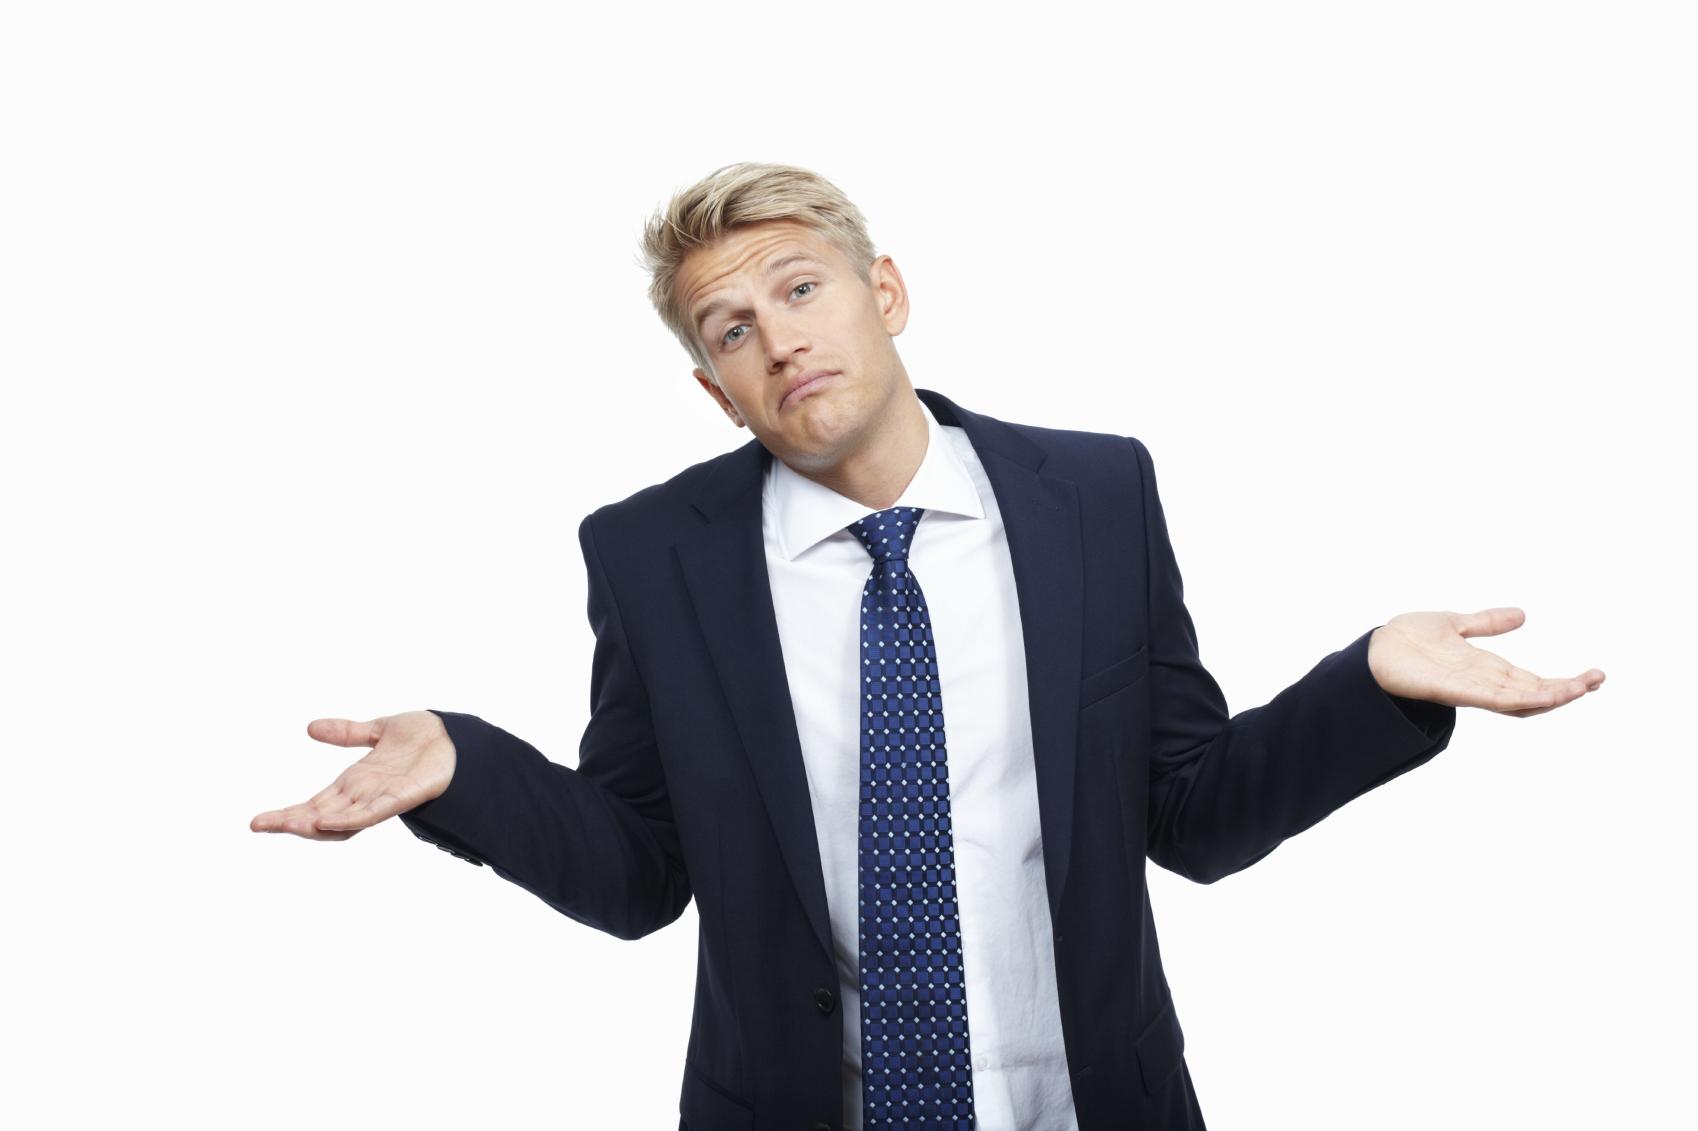 Portrait of clueless husband man shrugging on white background